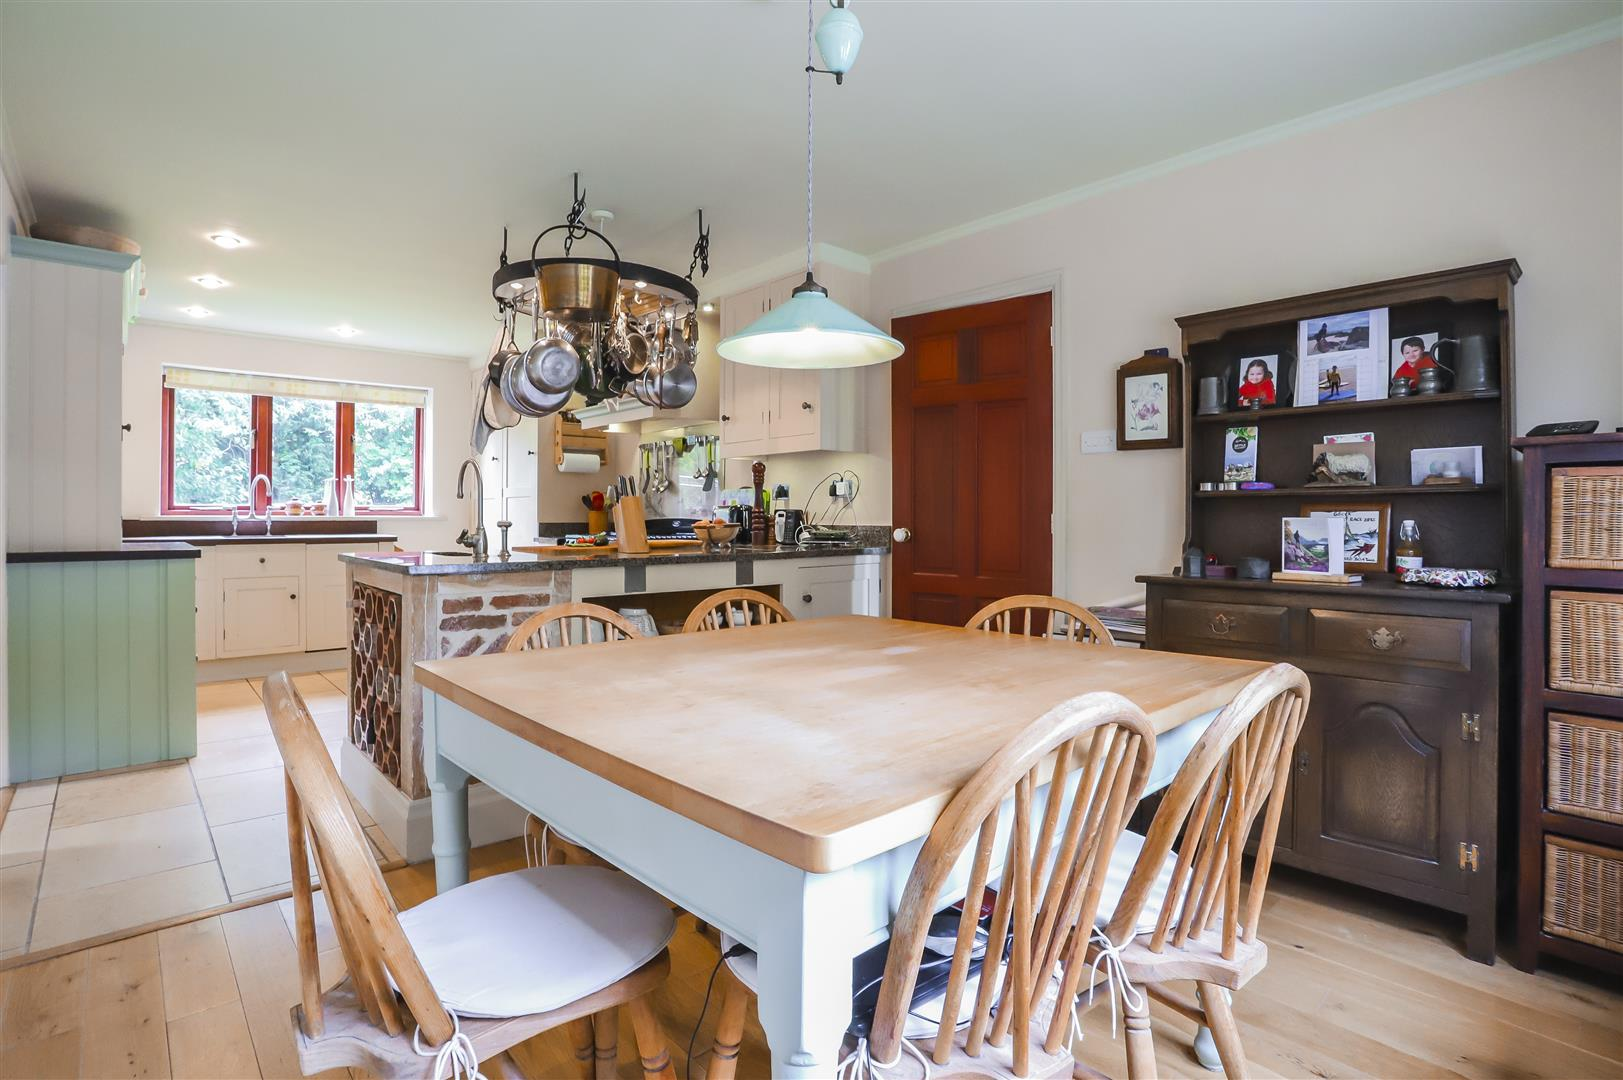 4 Bedroom Detached House For Sale - Image 4